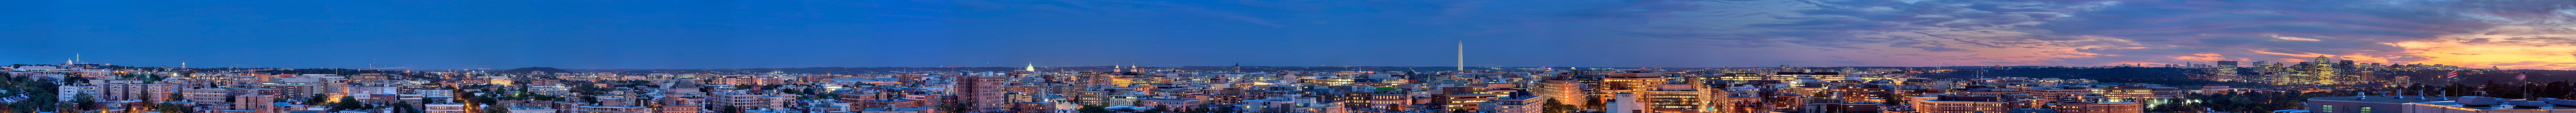 panorama night view